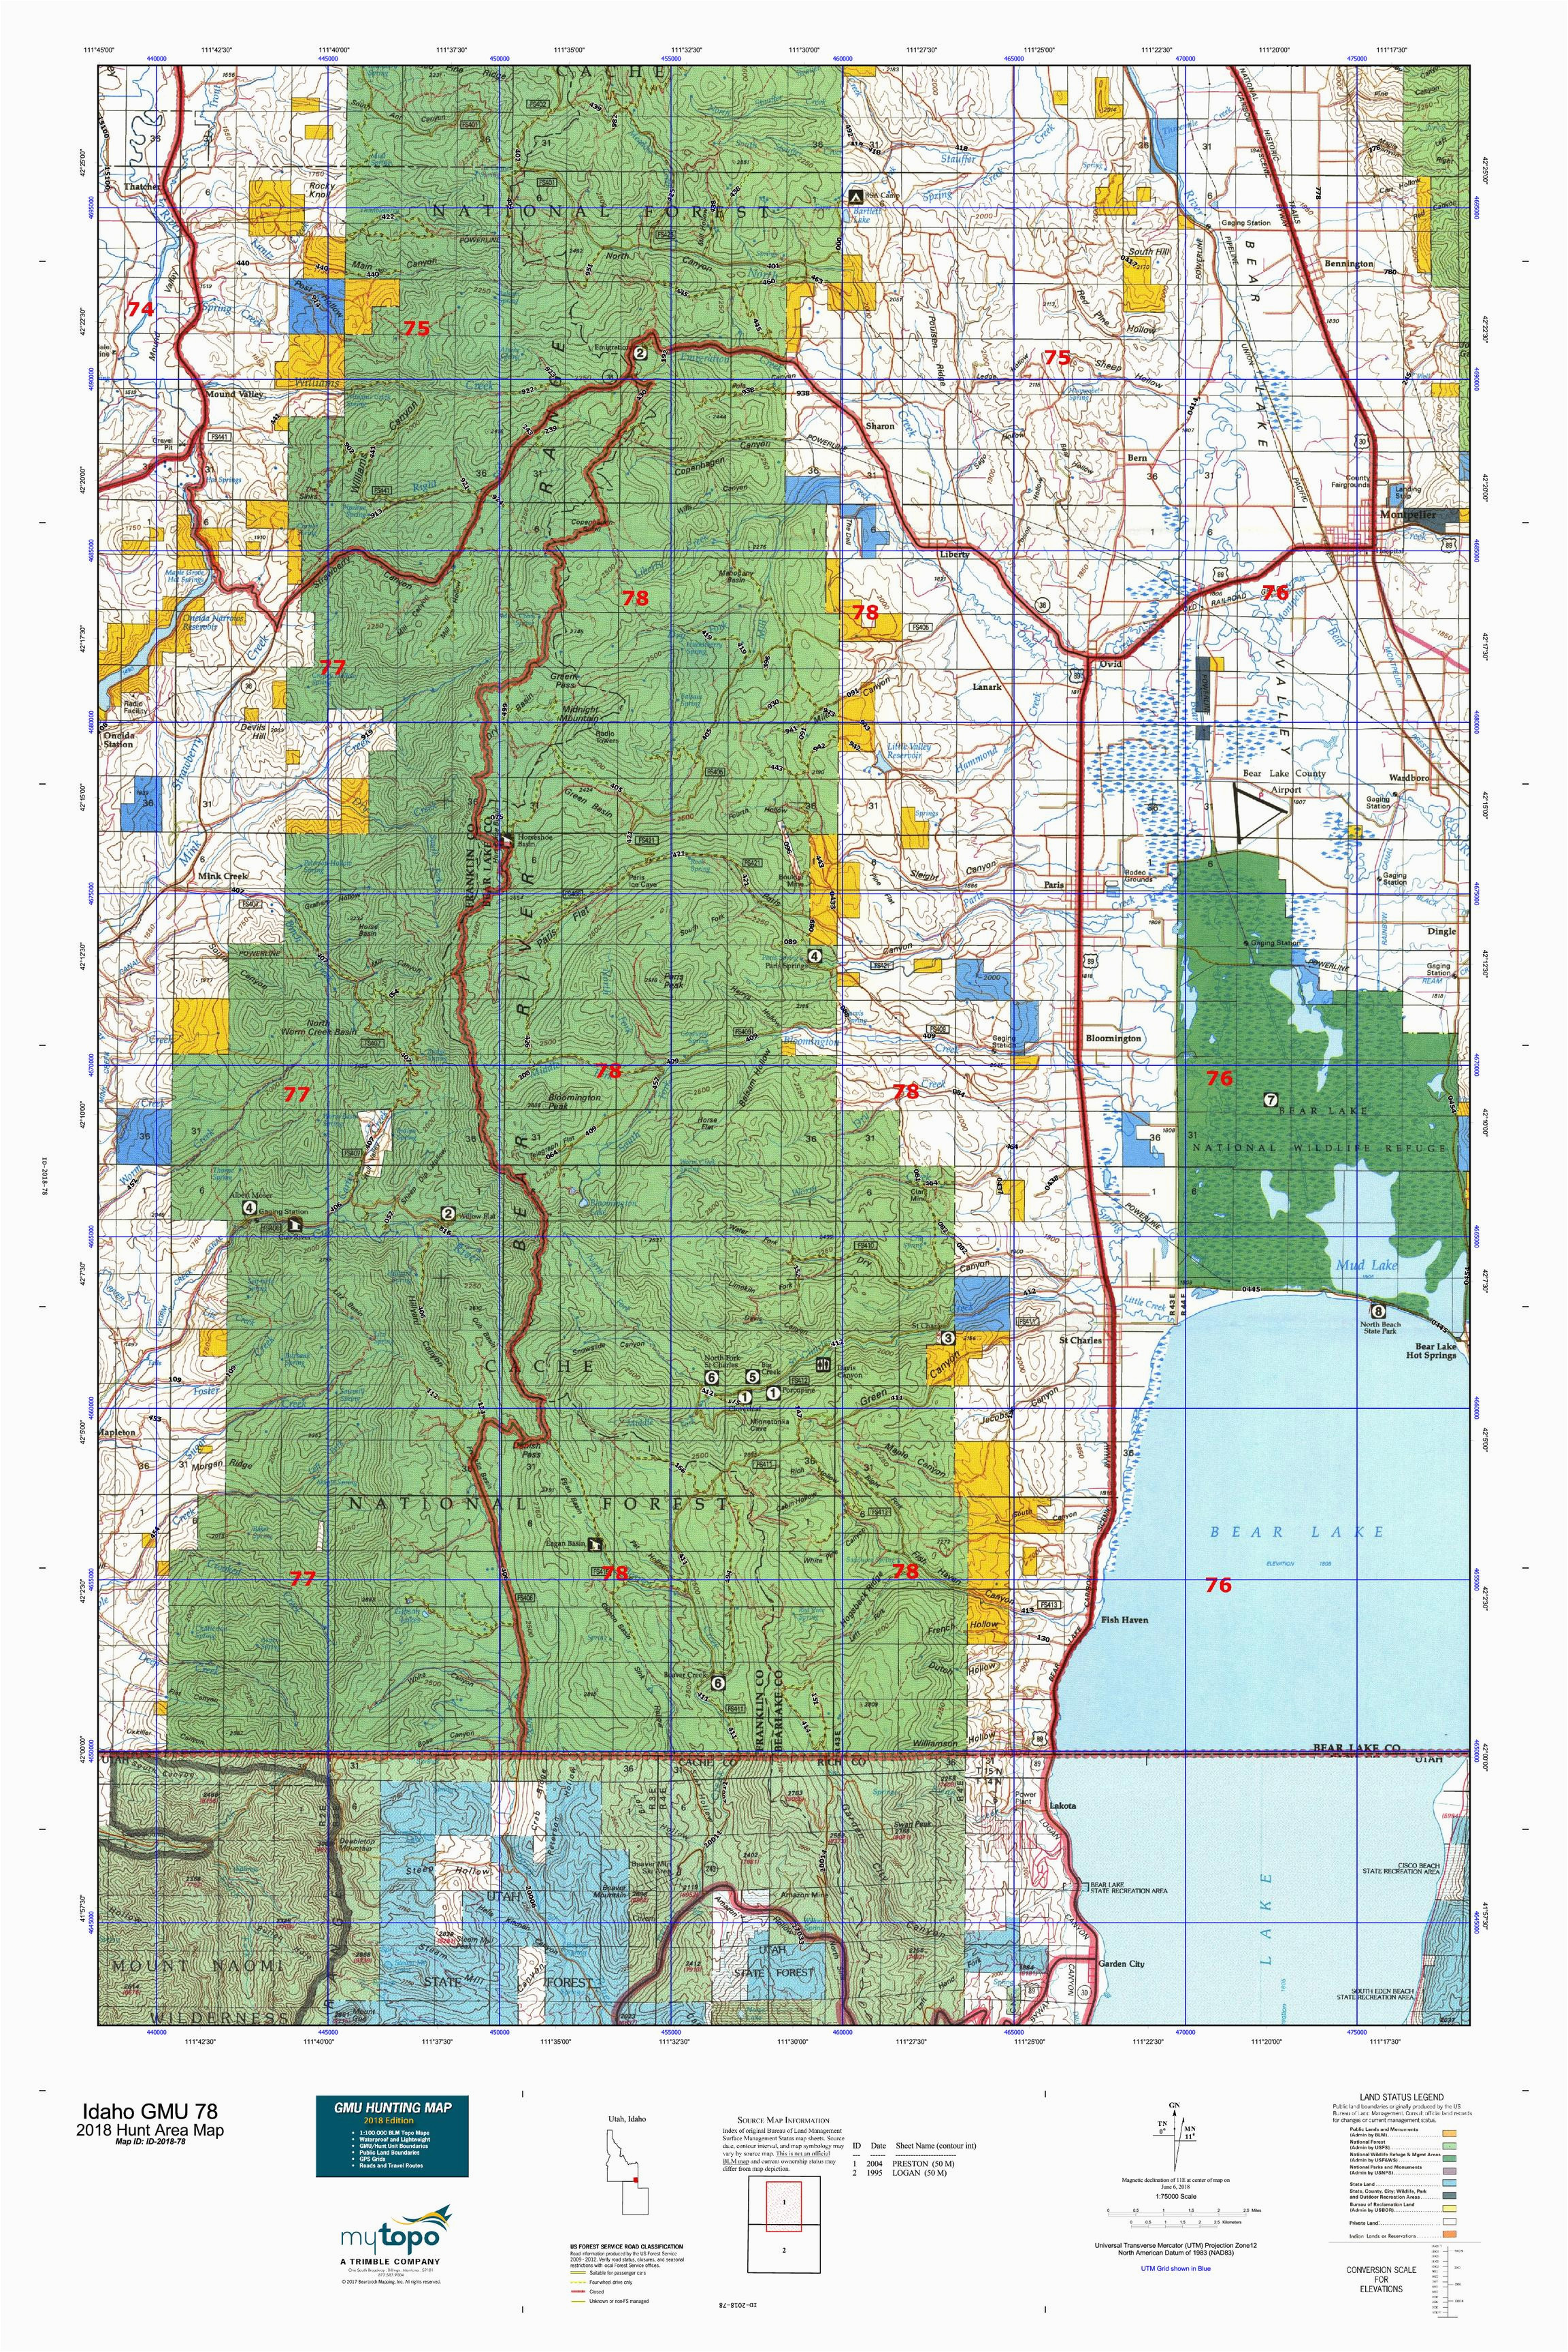 idaho gmu 78 map mytopo